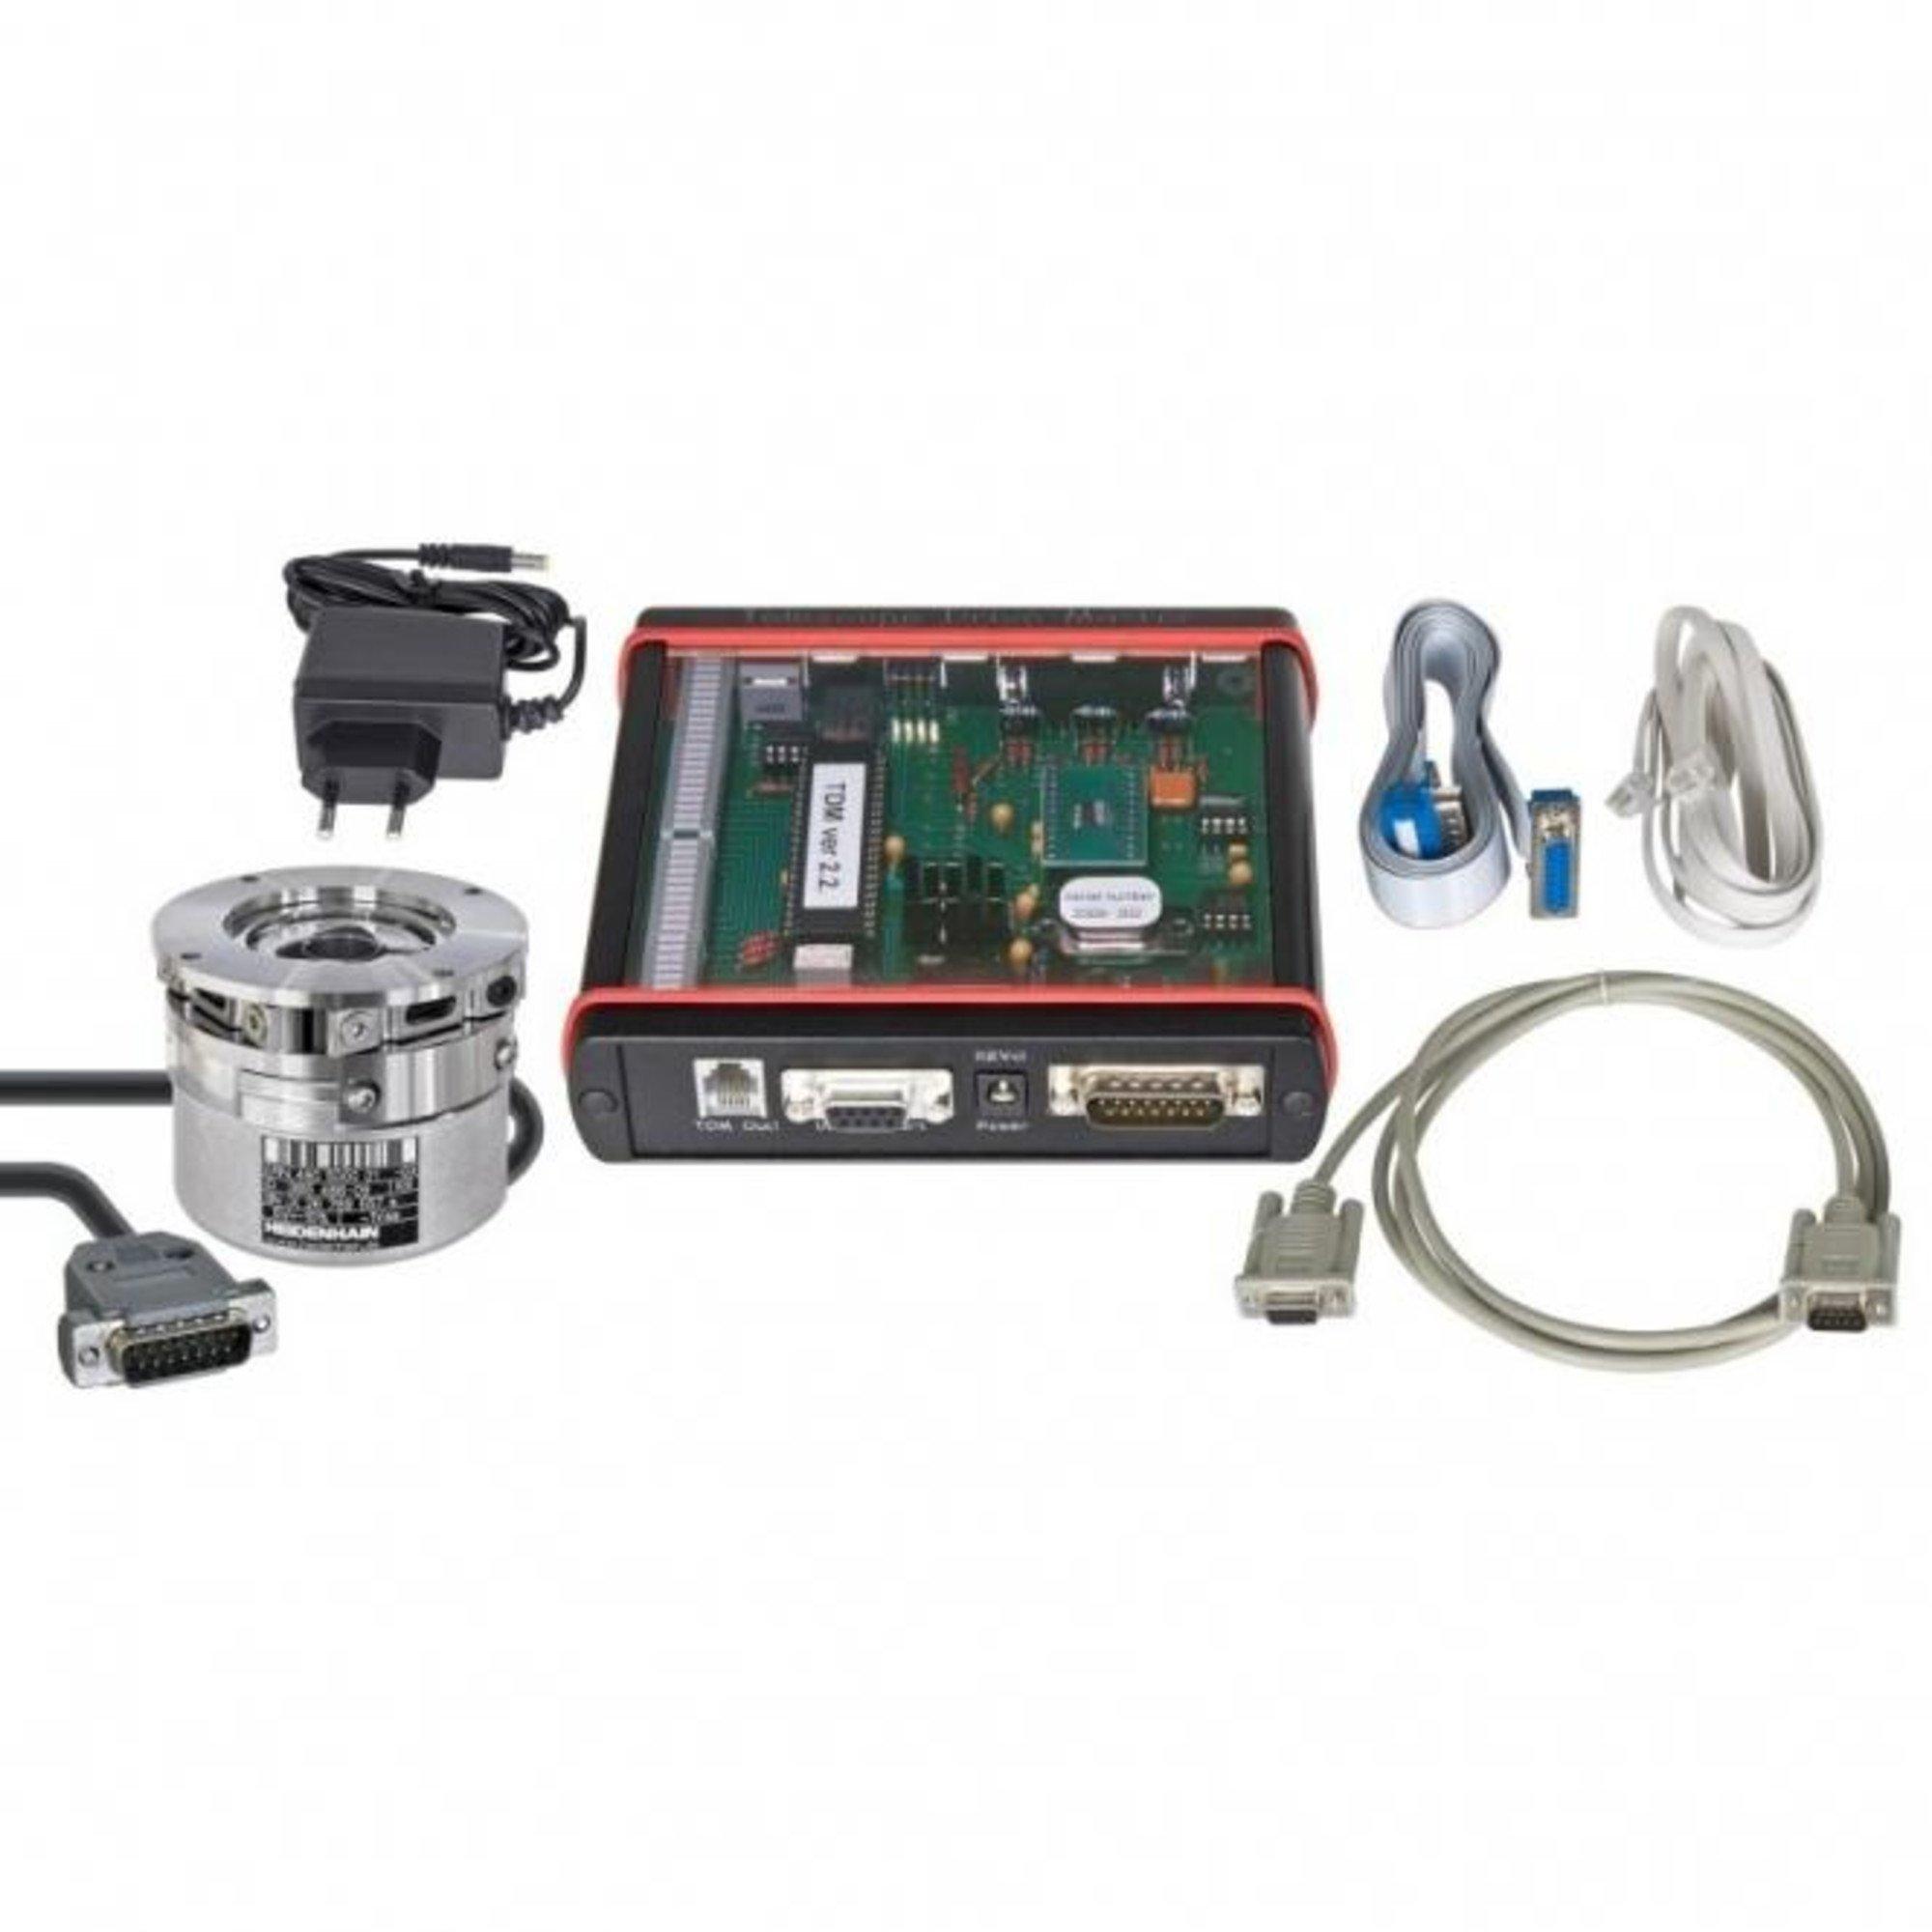 Explore Scientific Telescope Drive Master Ver. 2.5 Encoder and Electronics Set (Requires Mount Adapter) by Explore Scientific